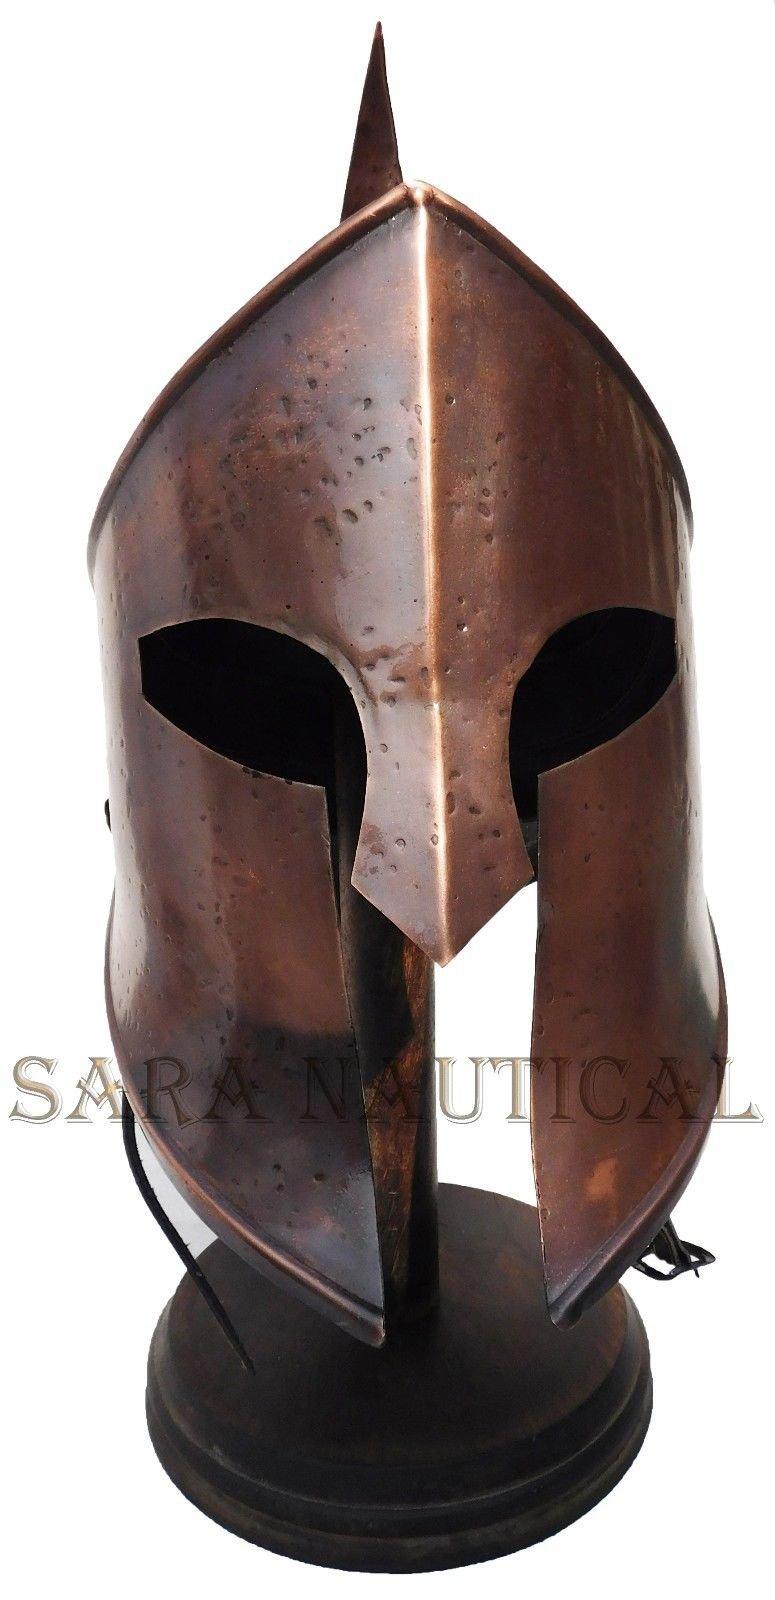 All Metal 300 Spartan Helmet Metal Collectible Decorative Antique Item Halloween Helmet by Expressions Enterprises (Image #2)